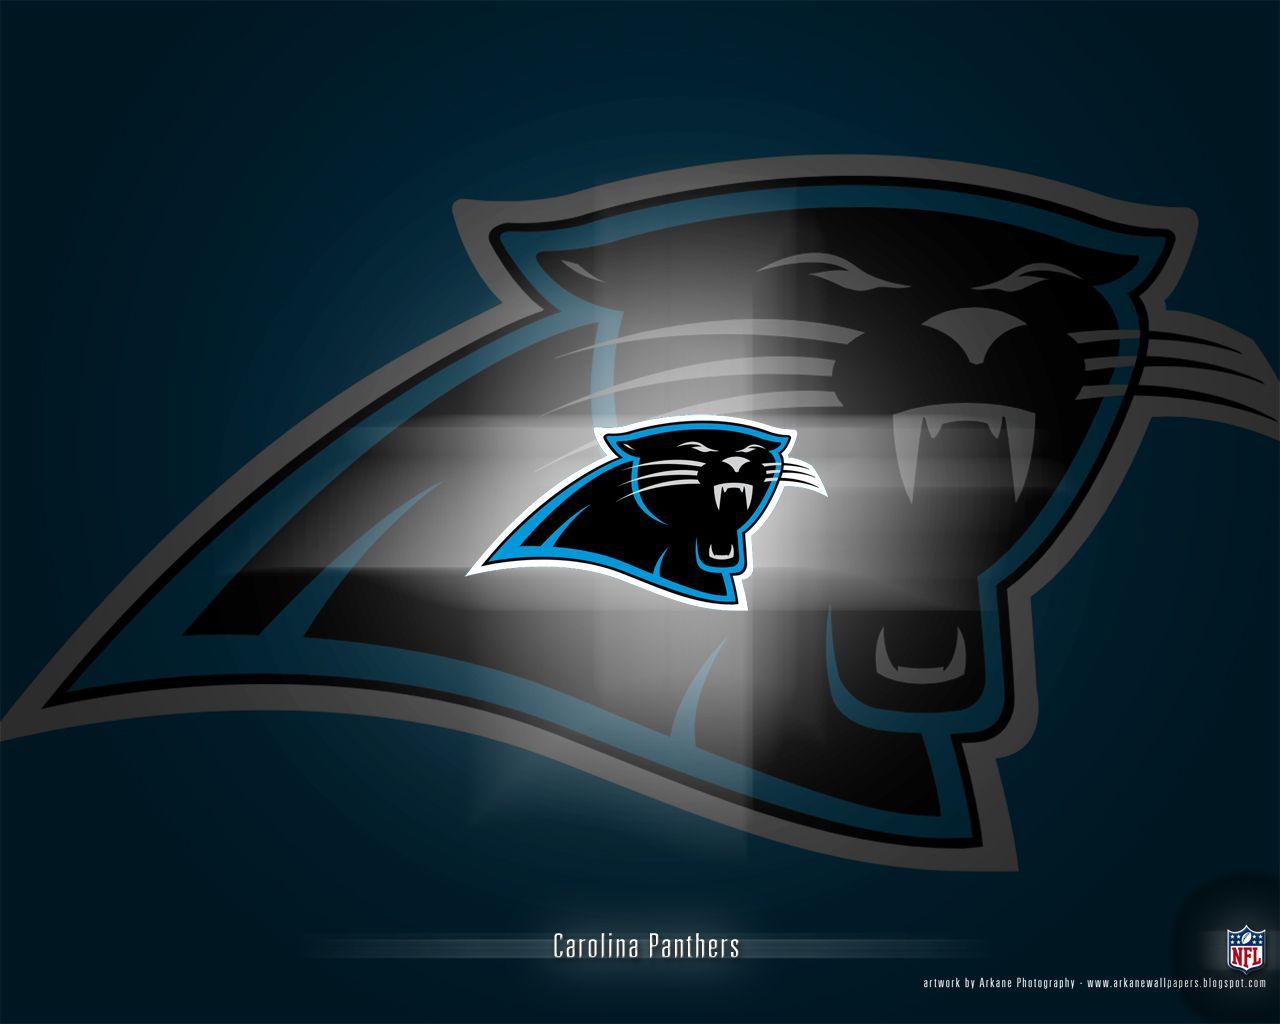 Arkane Nfl Wallpapers Carolina Panthers Vol 1 Carolina Panthers Carolina Panthers Wallpaper Panthers